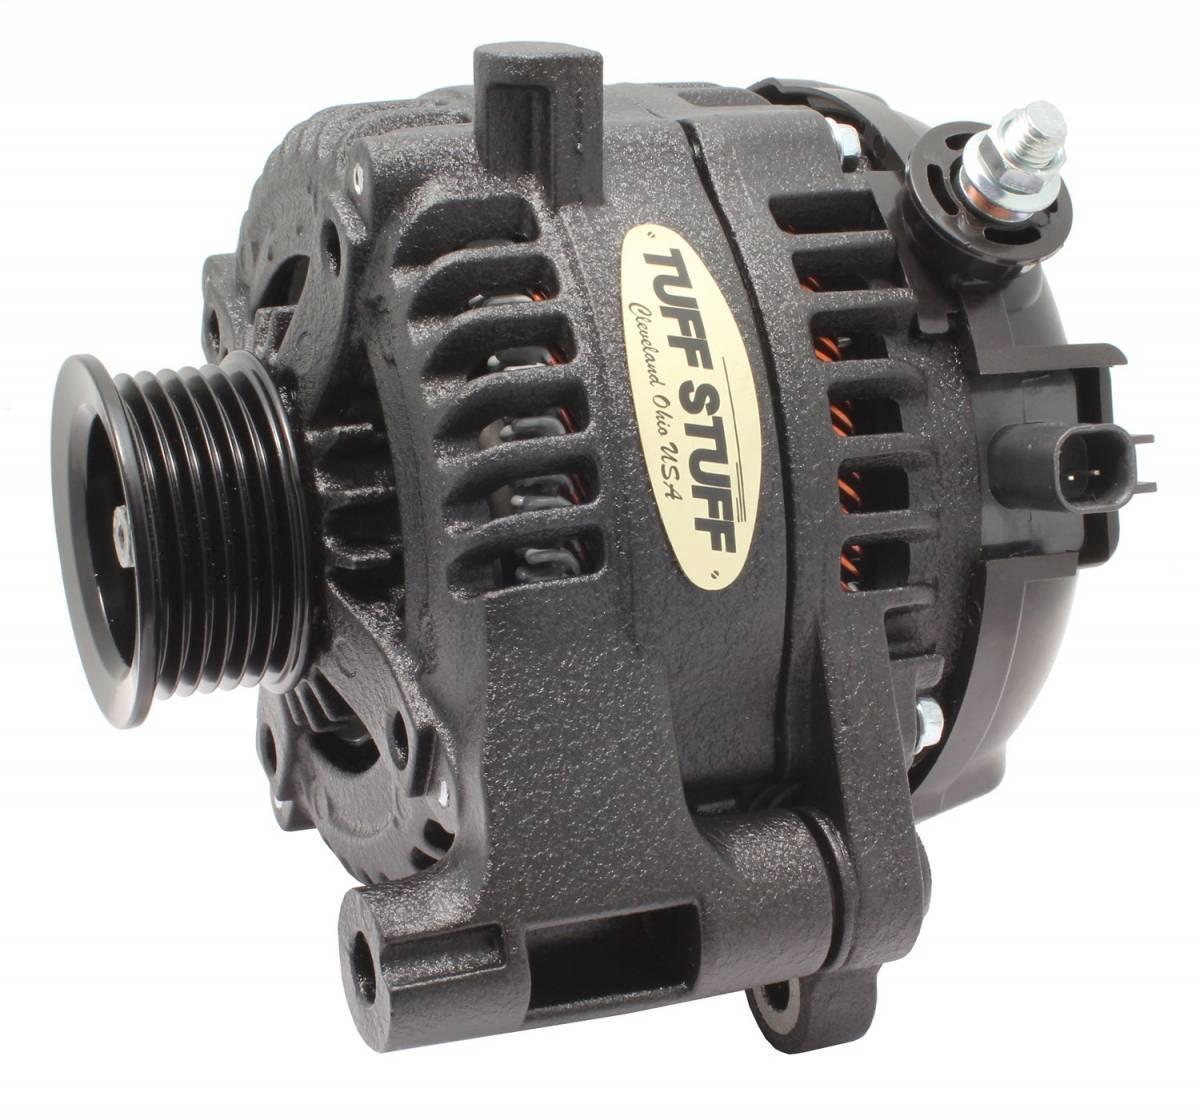 Tuff-Stuff 7514B Alternator, 175 amp, 12V, External Regulator, 6 Rib Serpentine Pulley, Black Wrinkle, Jeep Wrangler JK 2012-18, Each